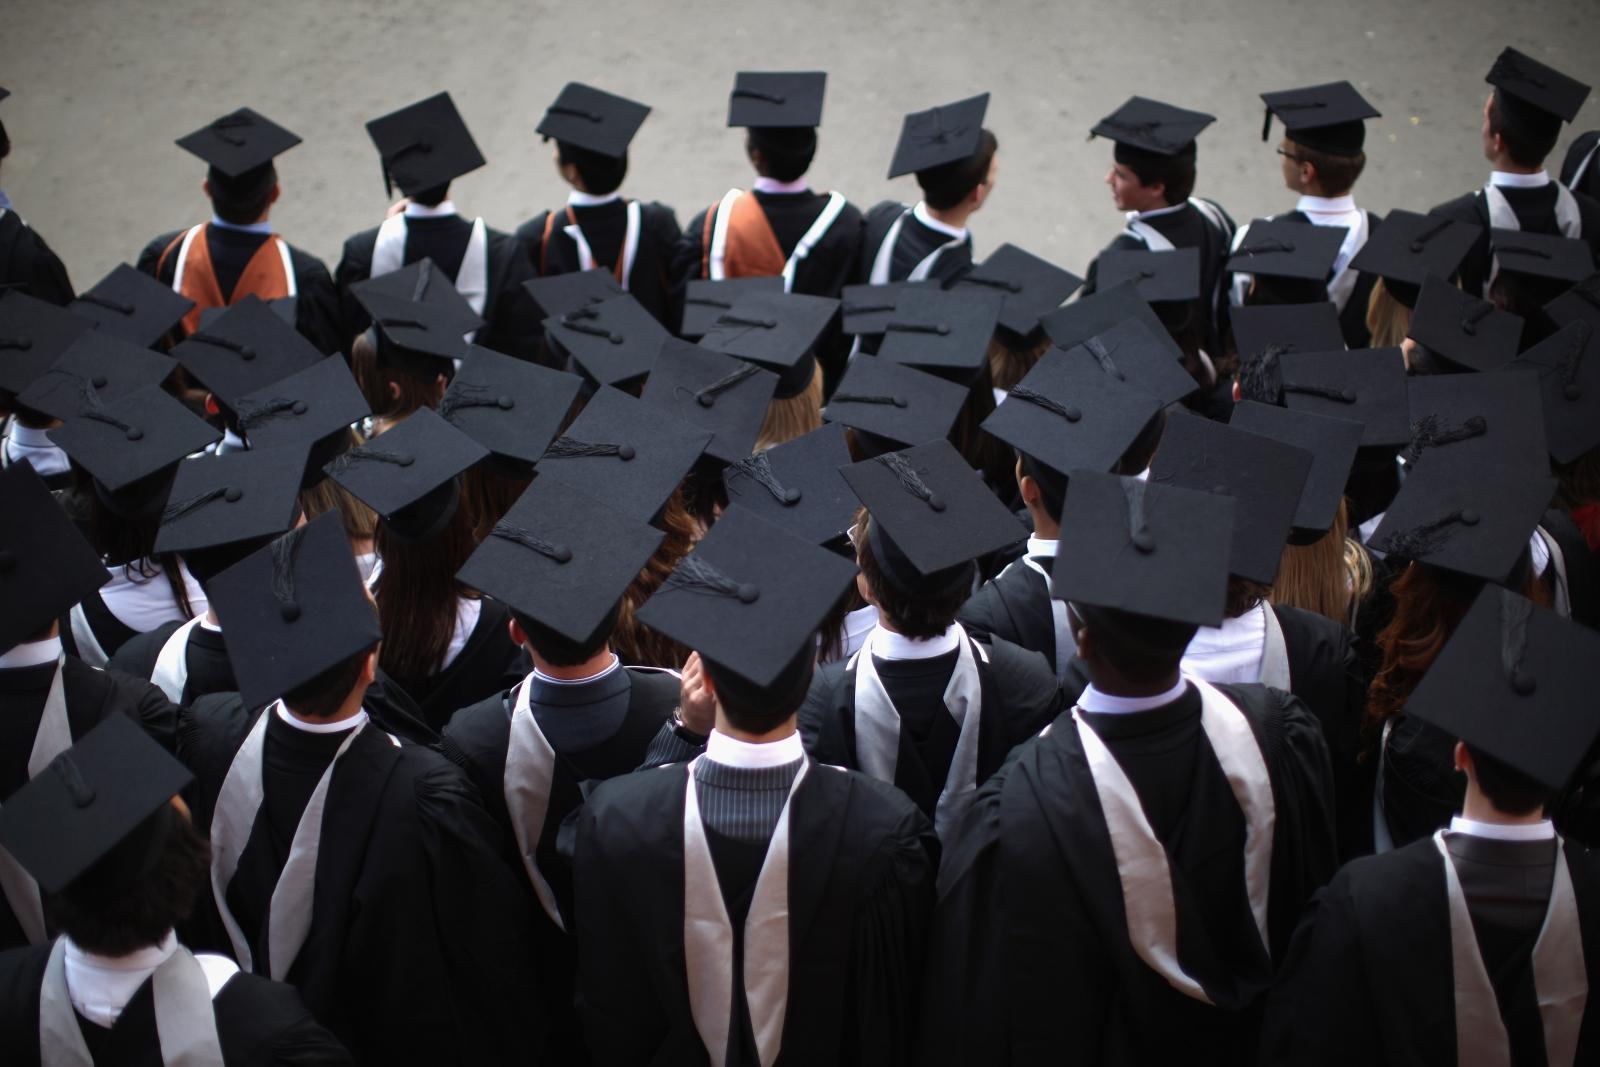 government identifies fake universities selling bogus degrees government identifies 190 fake universities selling bogus degrees in multi million pound industry